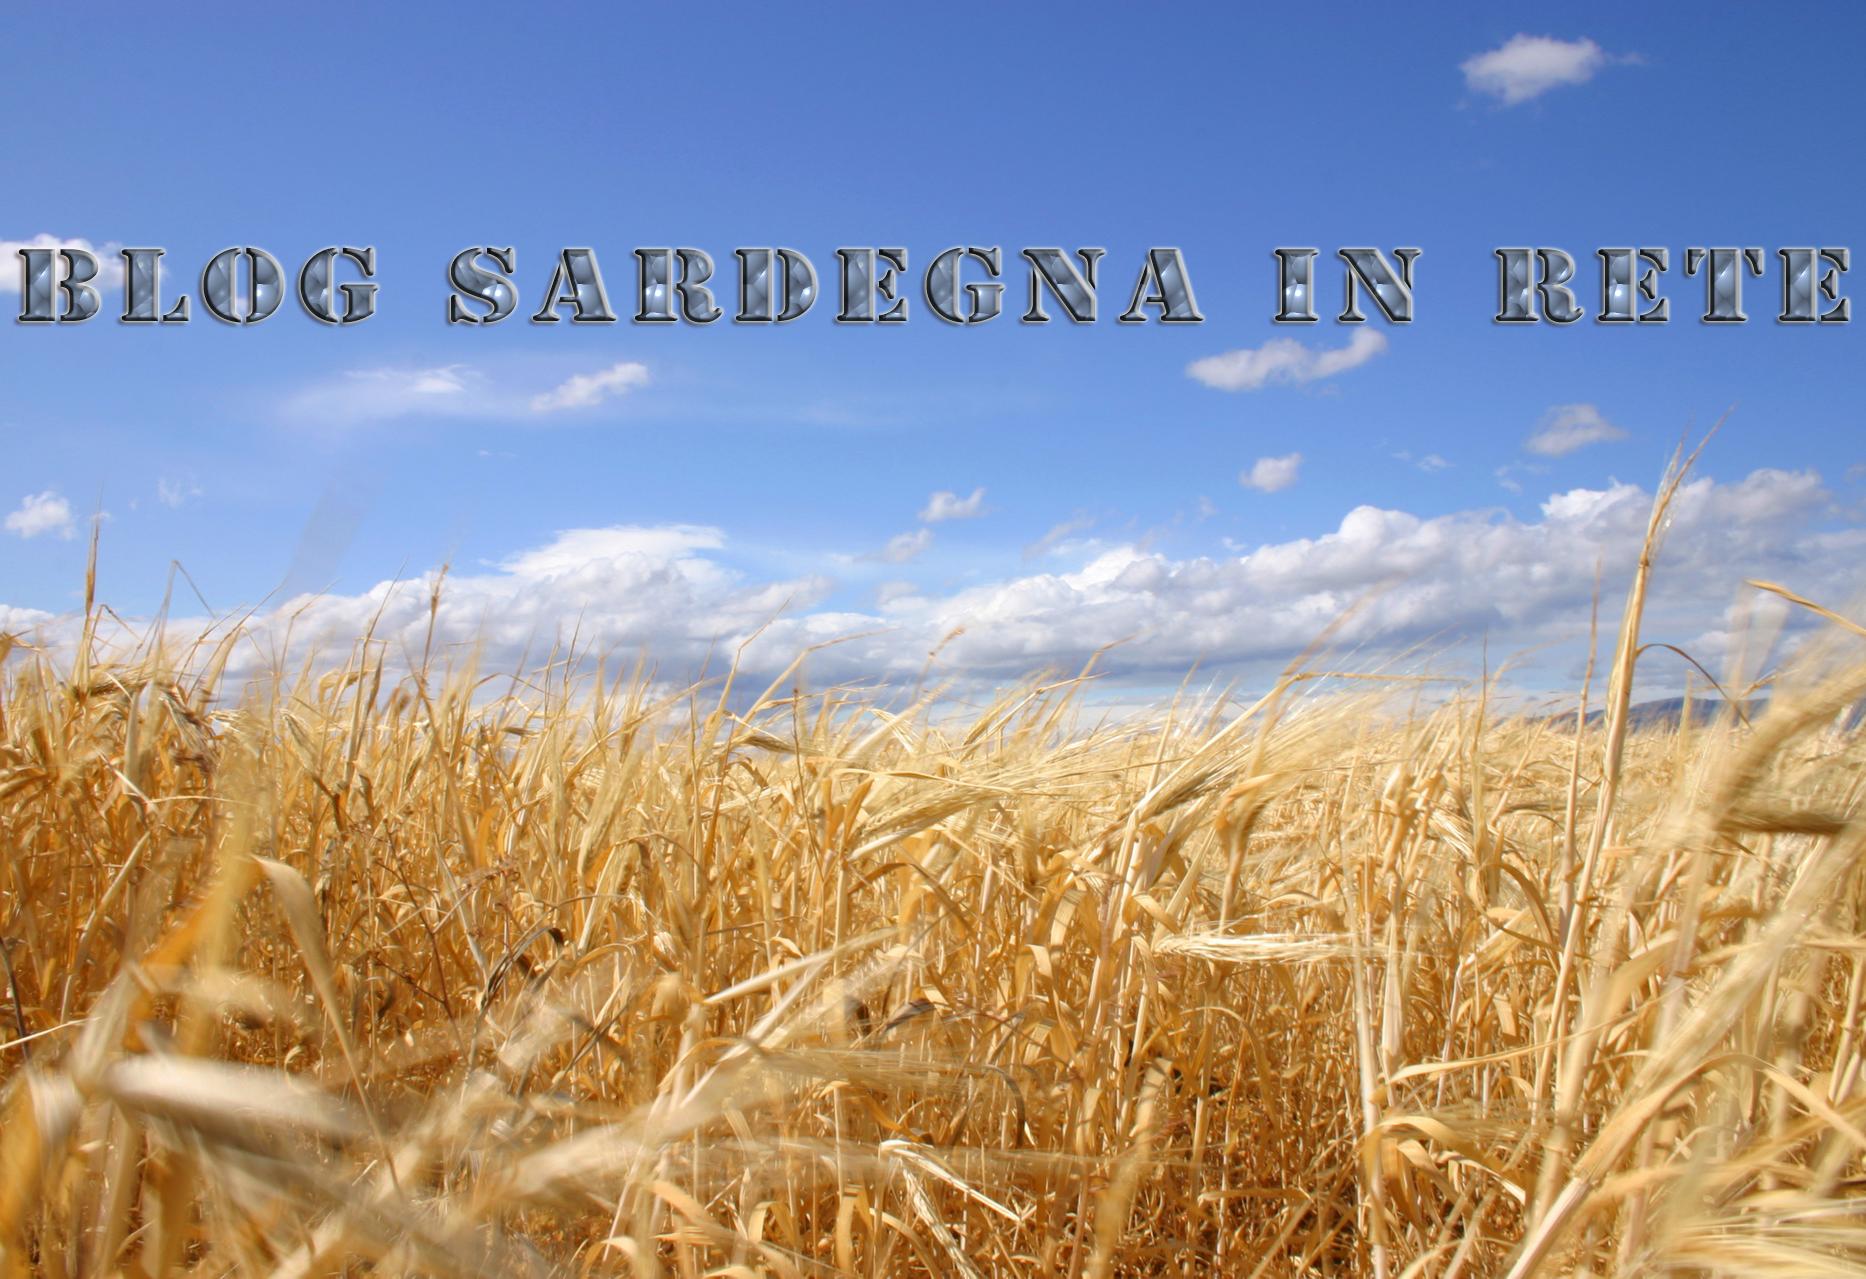 Spighe al vento Blog Sardegna in Rete